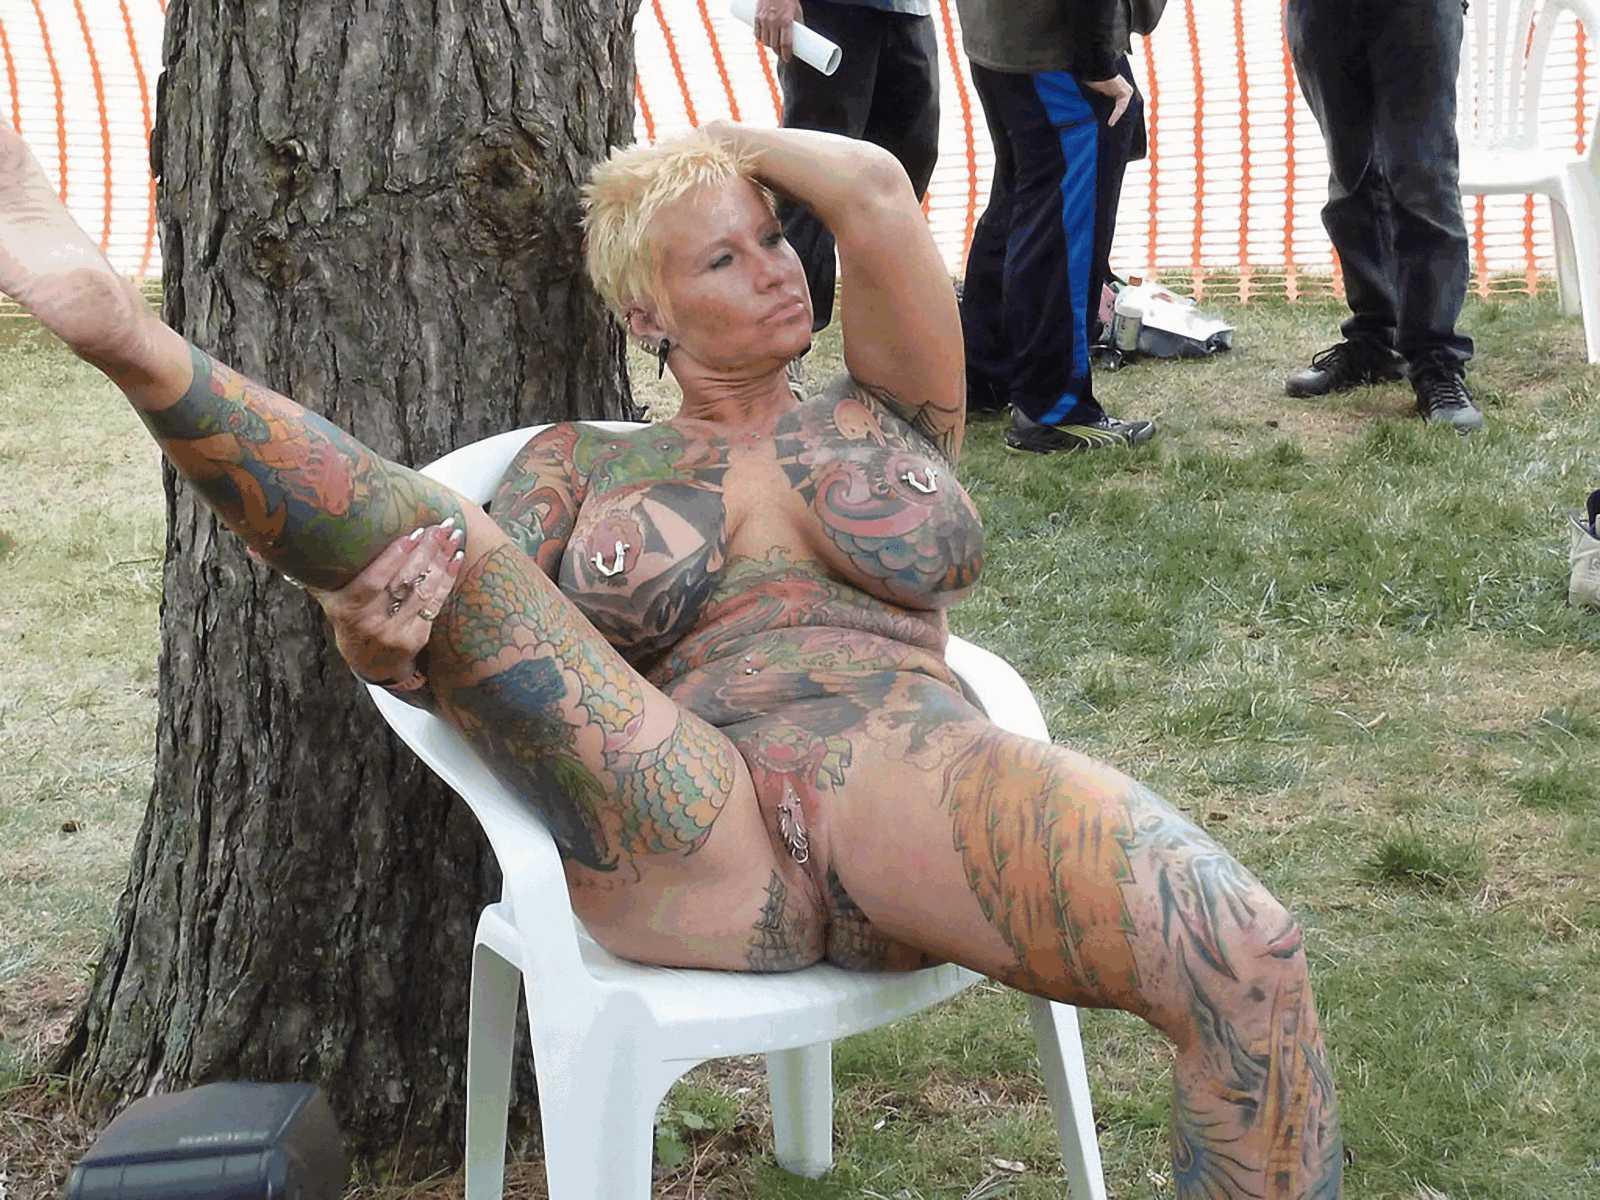 Dick tattoos and dick mods photo album  xxx tube